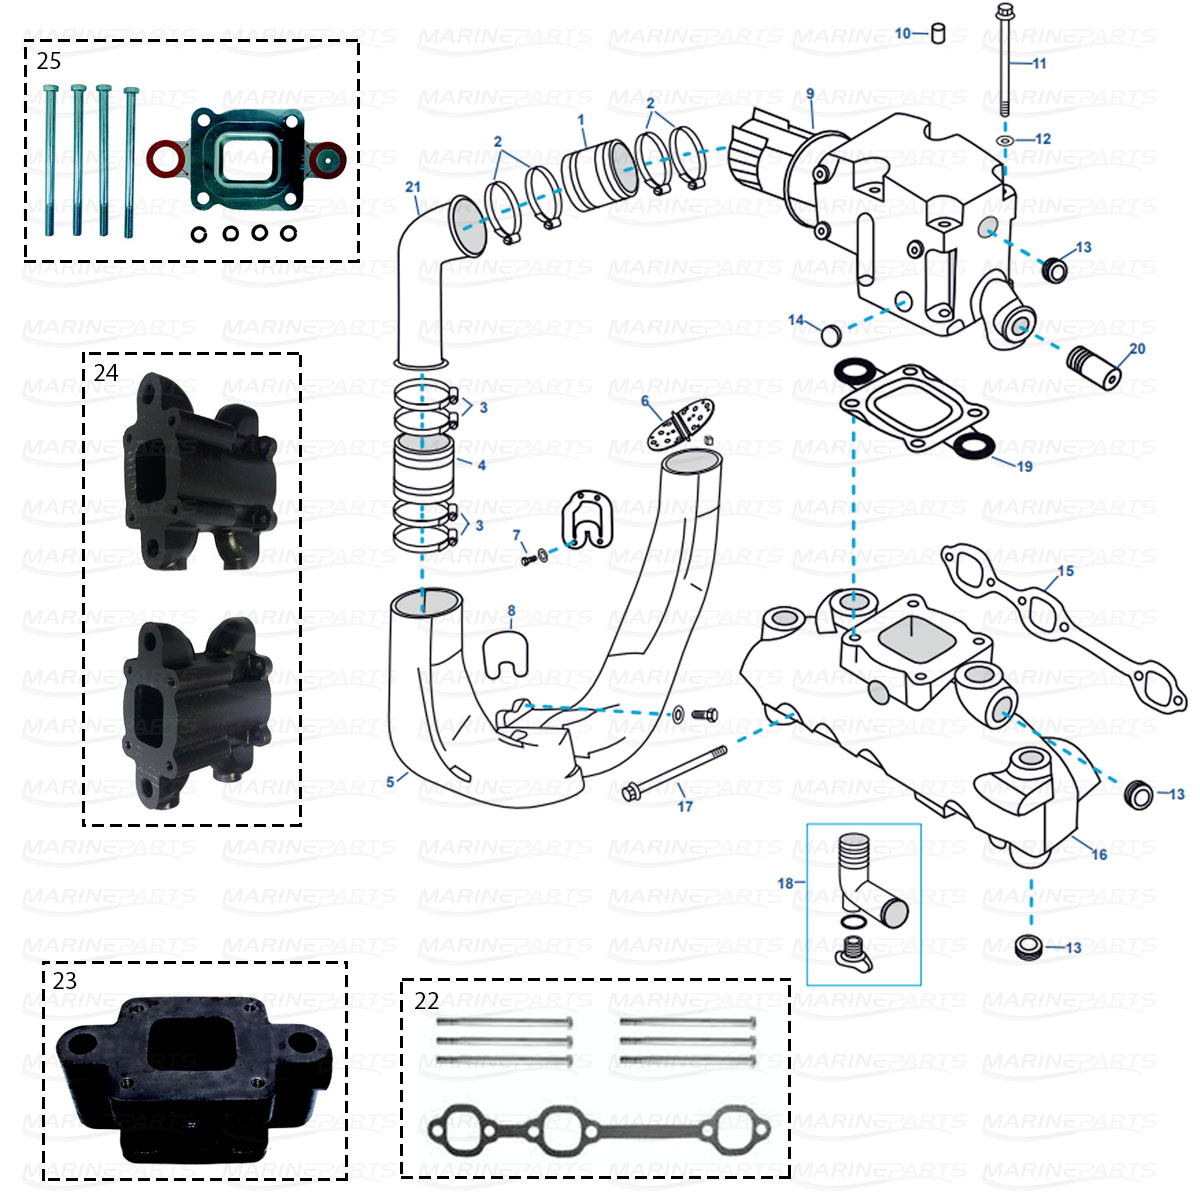 Exhaust parts for MerCruiser GM 4.3 ltr. V6 MPI